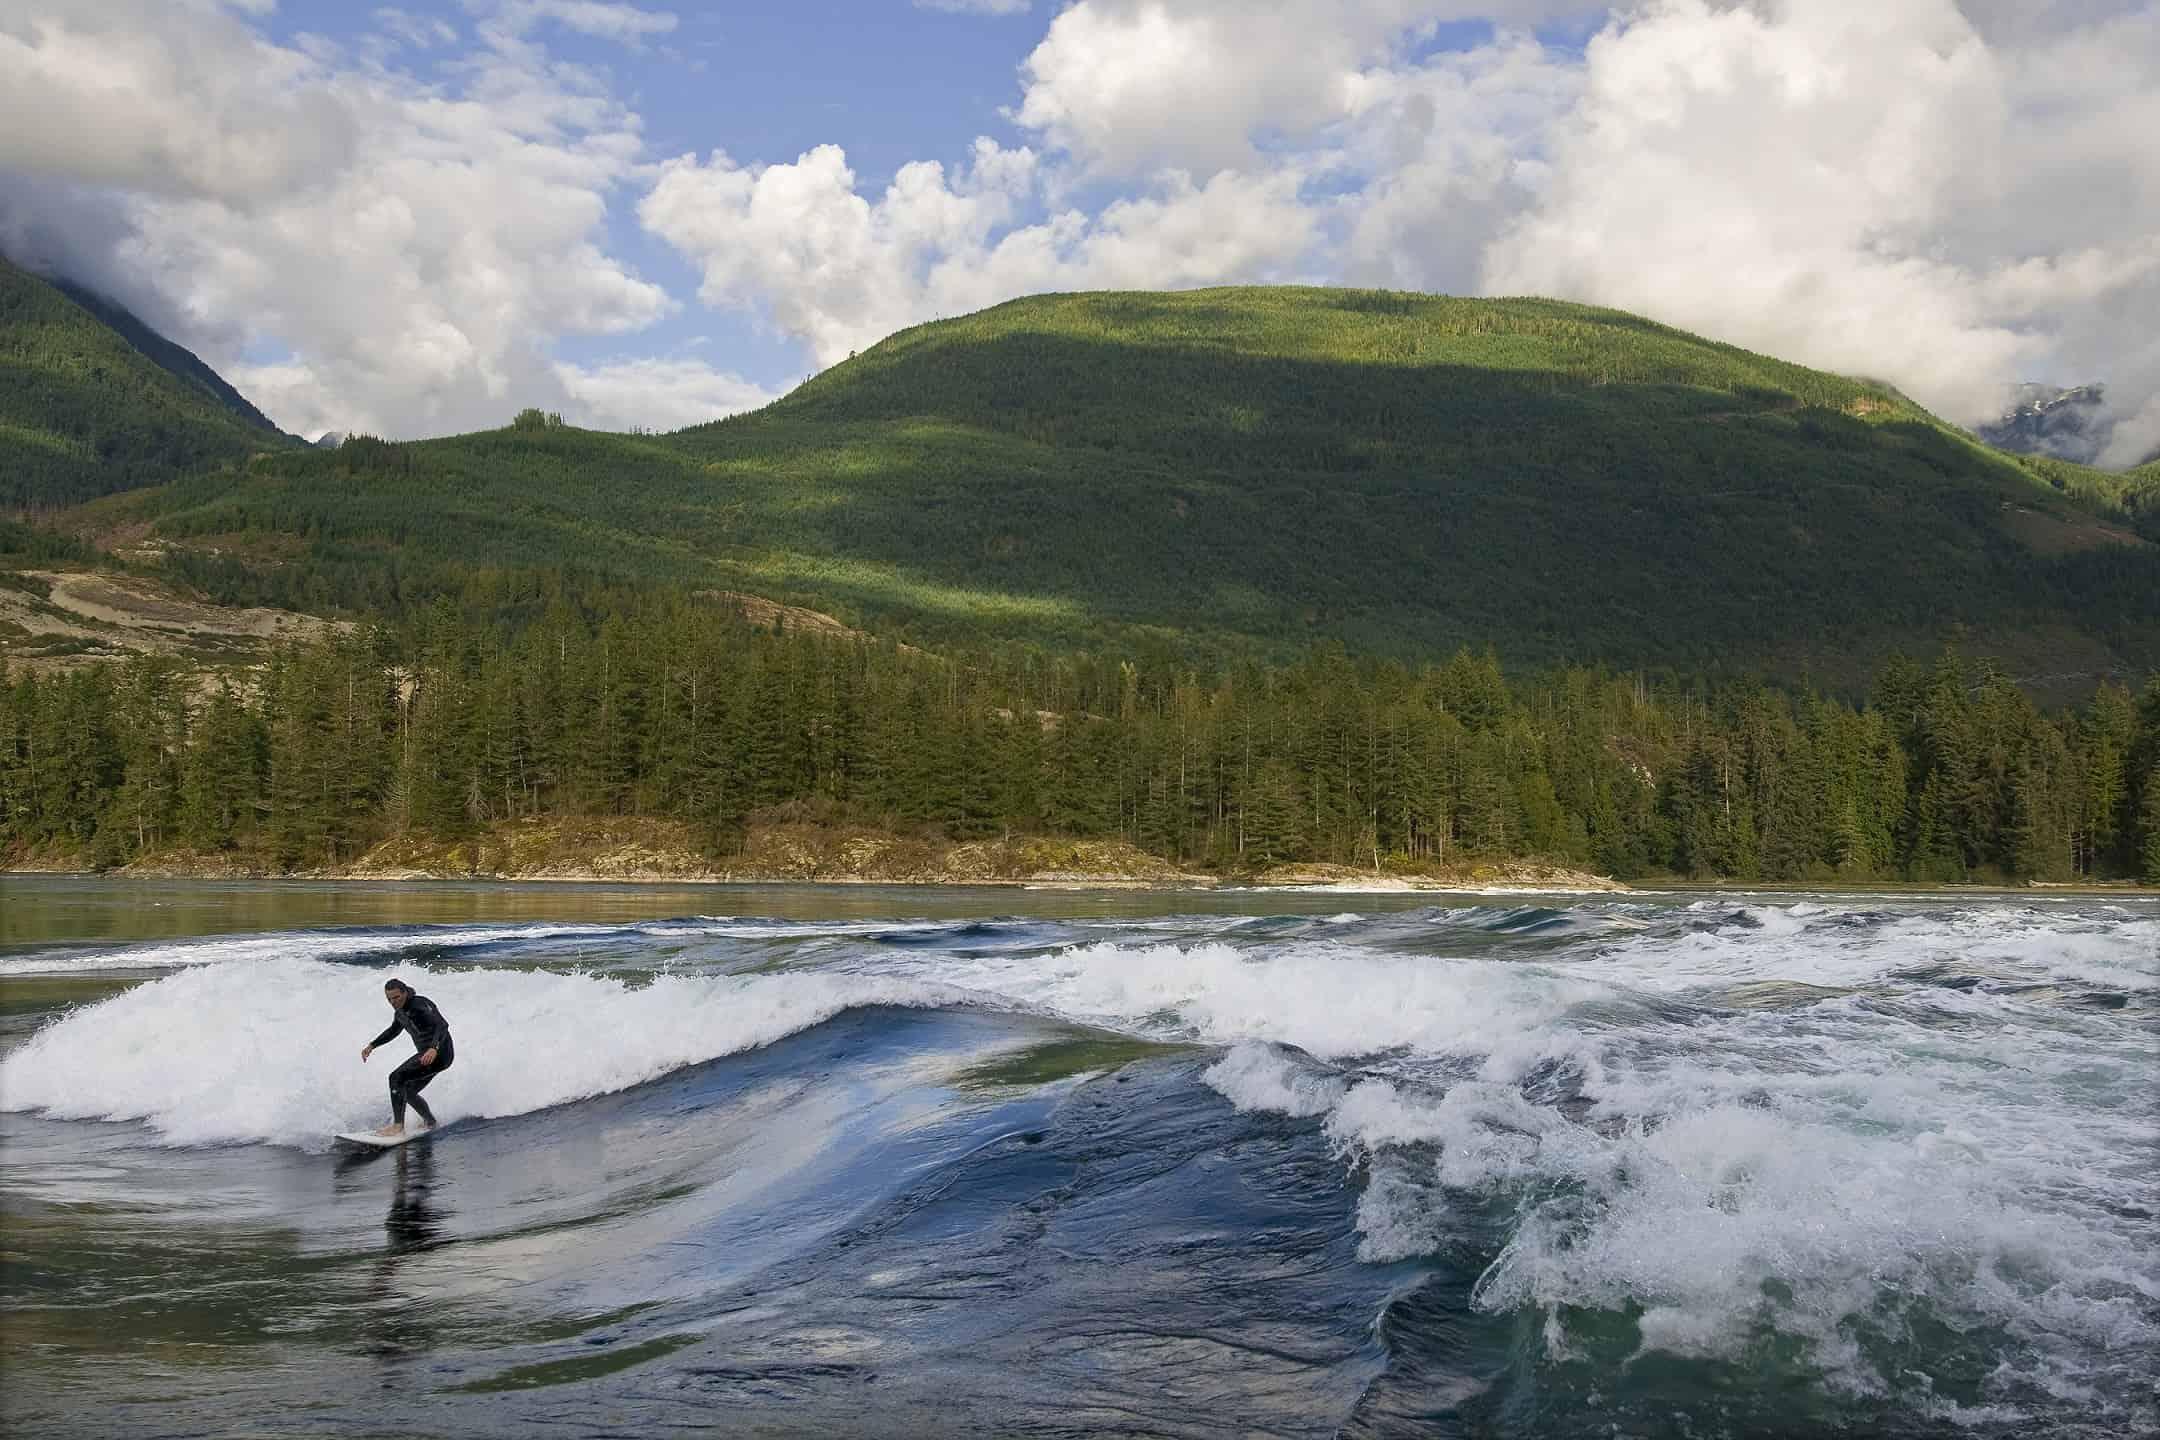 Skookumchuck Narrows How To Surf Tidal Rapids Explore